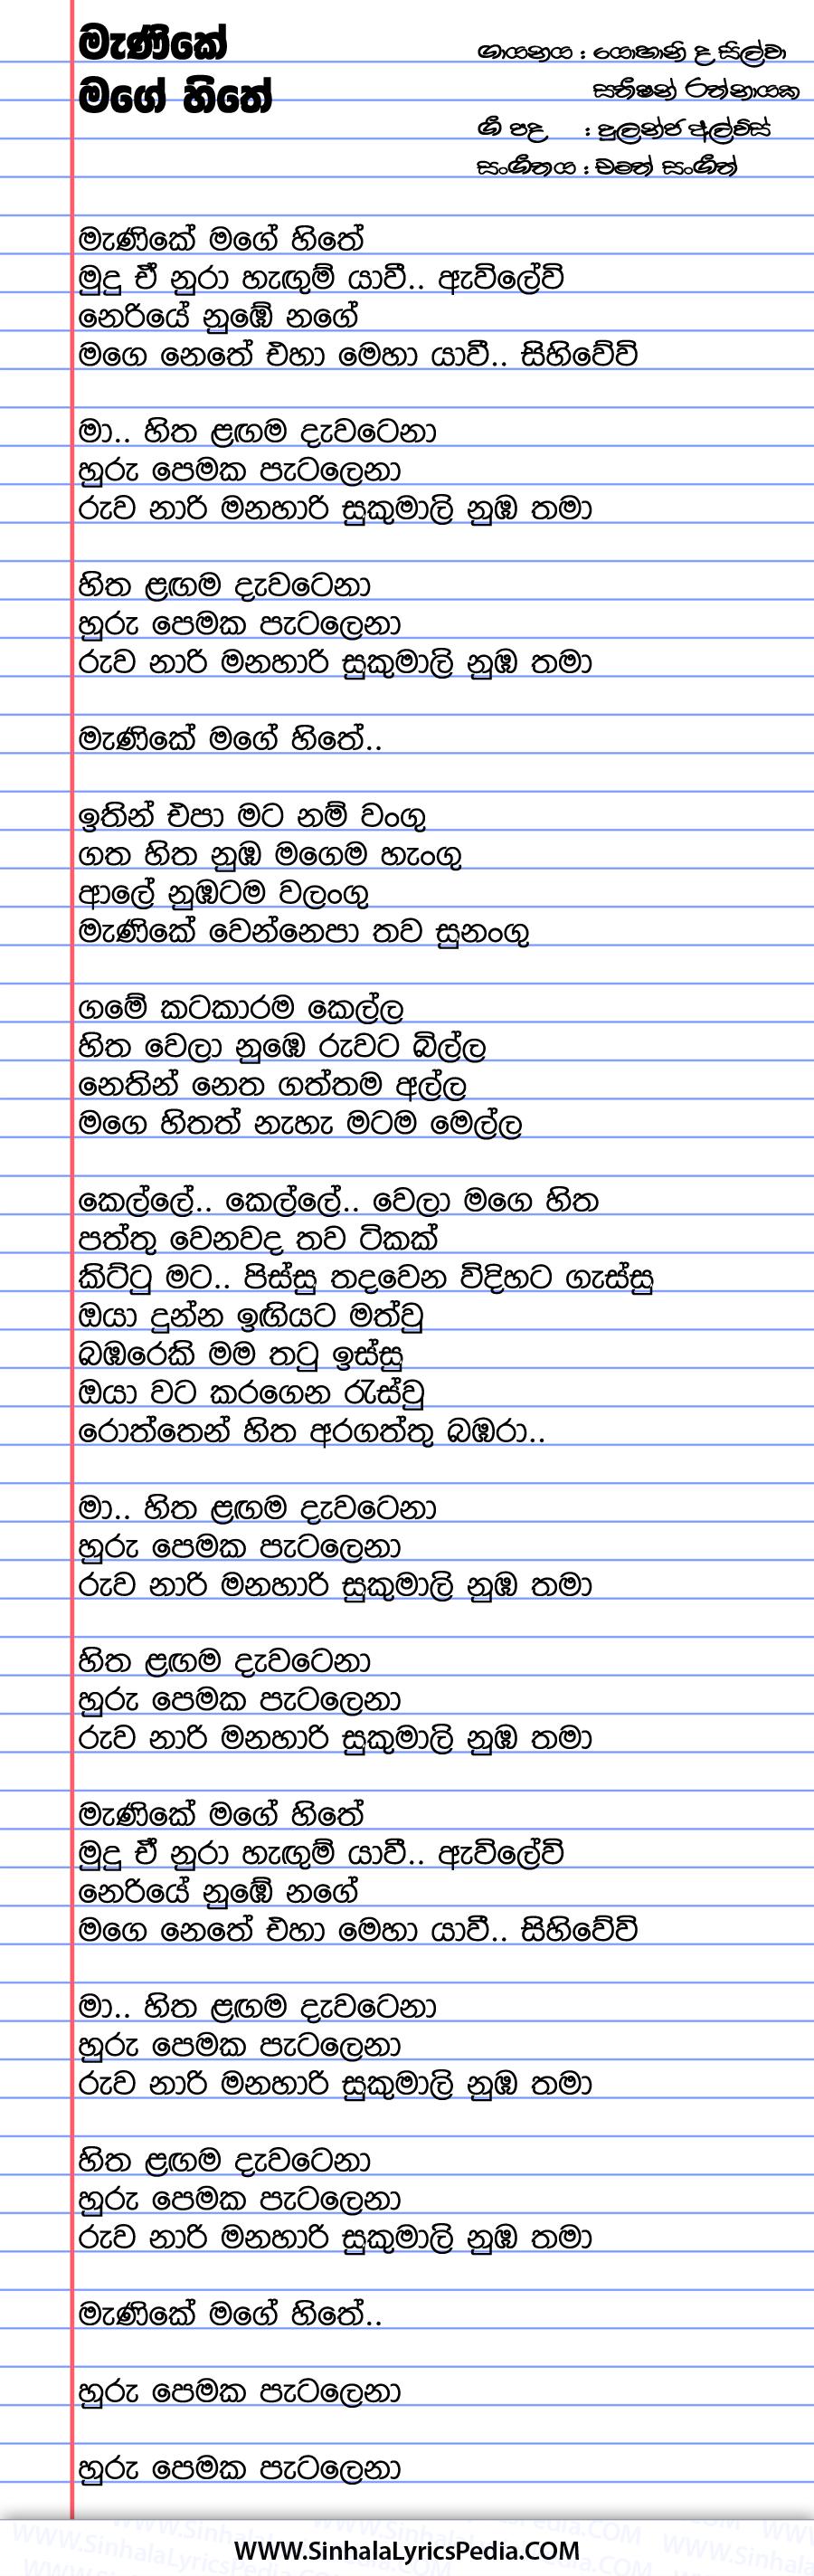 Manike Mage Hithe Song Lyrics